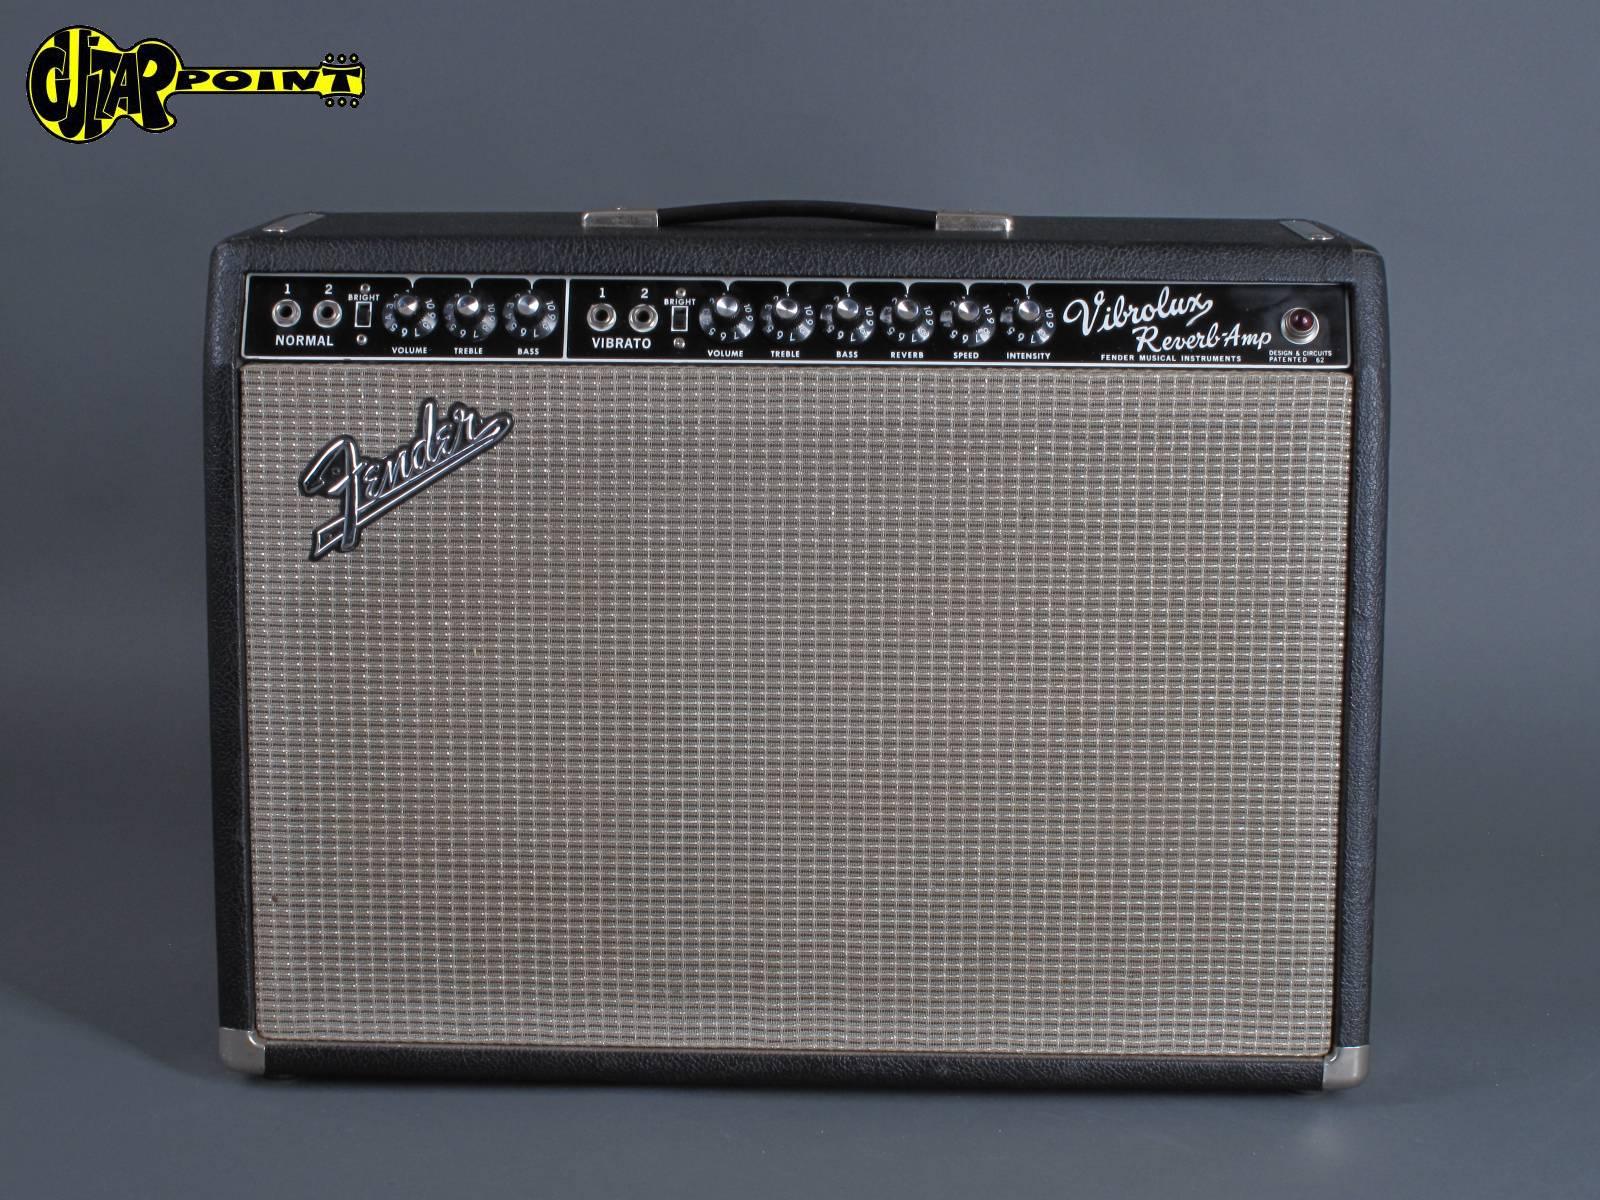 1967 Fender Vibrolux  Reverb Amp - Blackface !